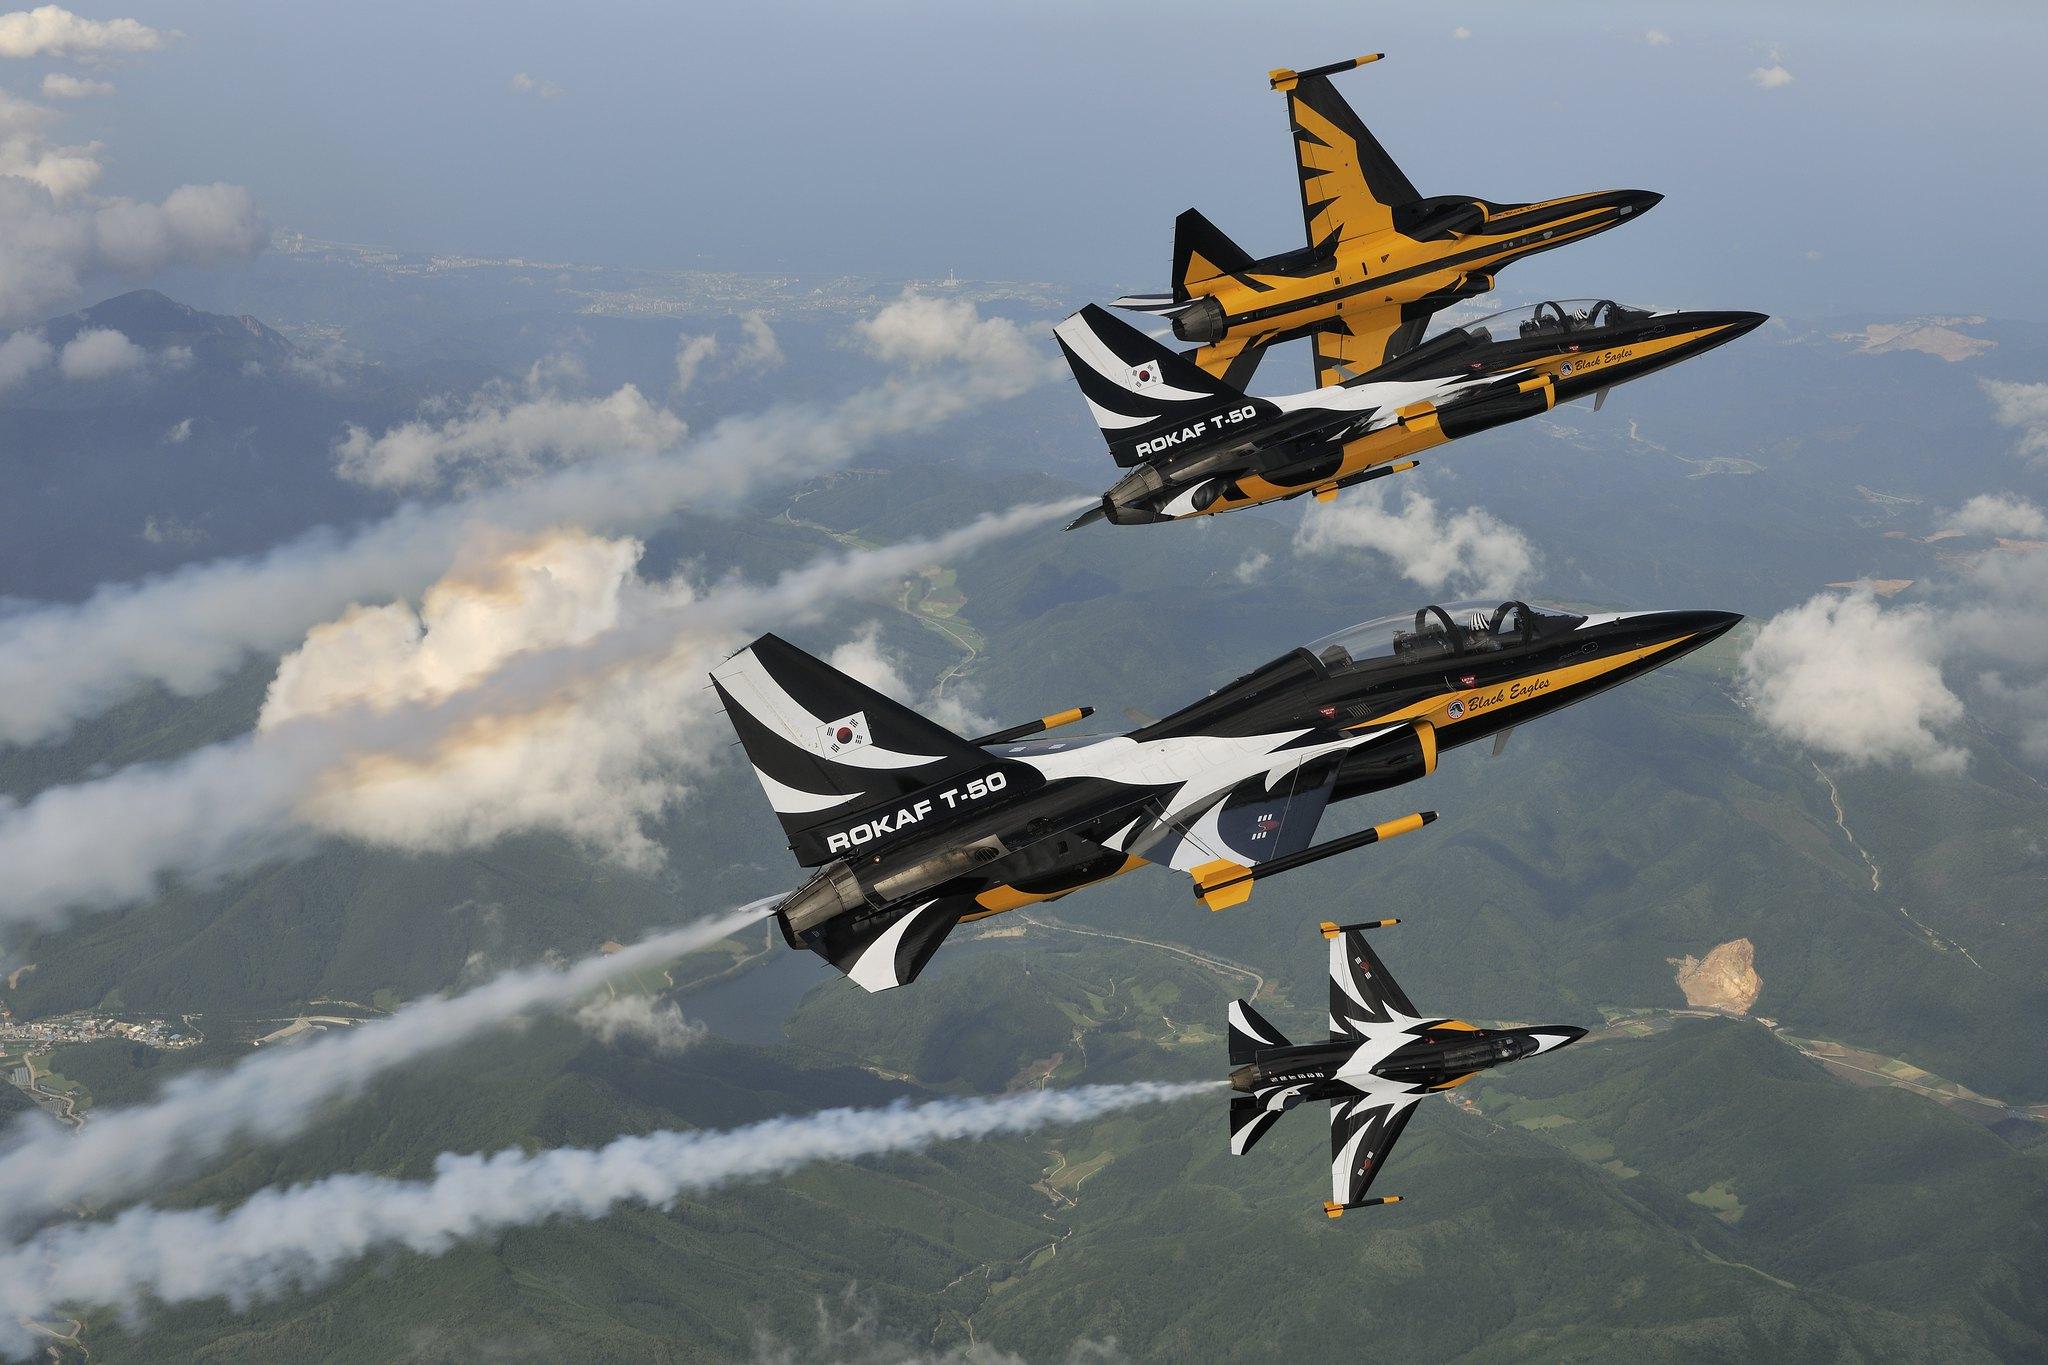 T-50B of the Black Eagles aerobatic team